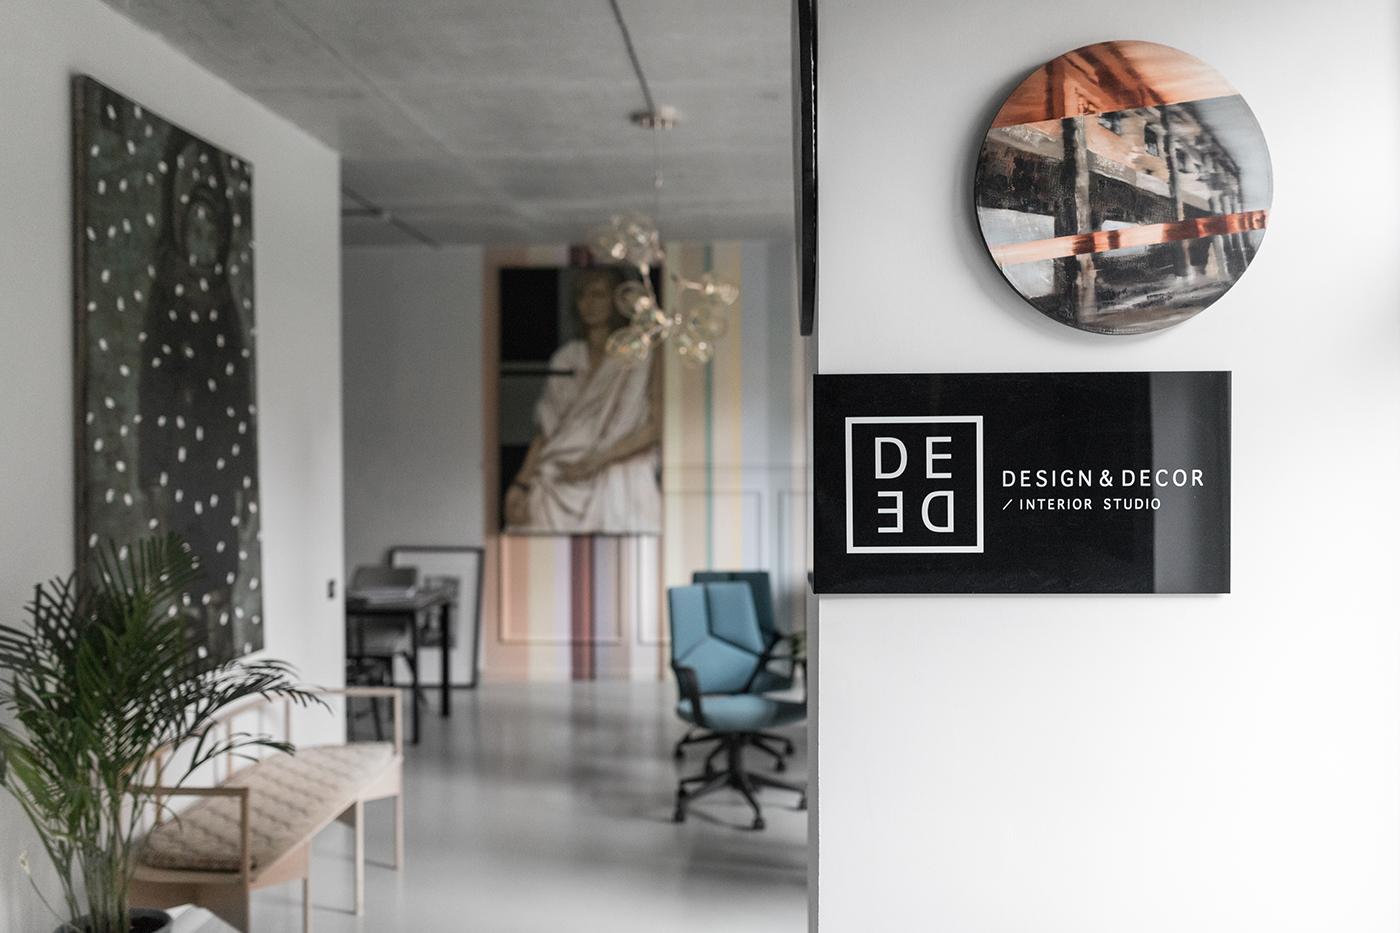 Interior design Office Design interior design  DE&DE Interior Studio Photography